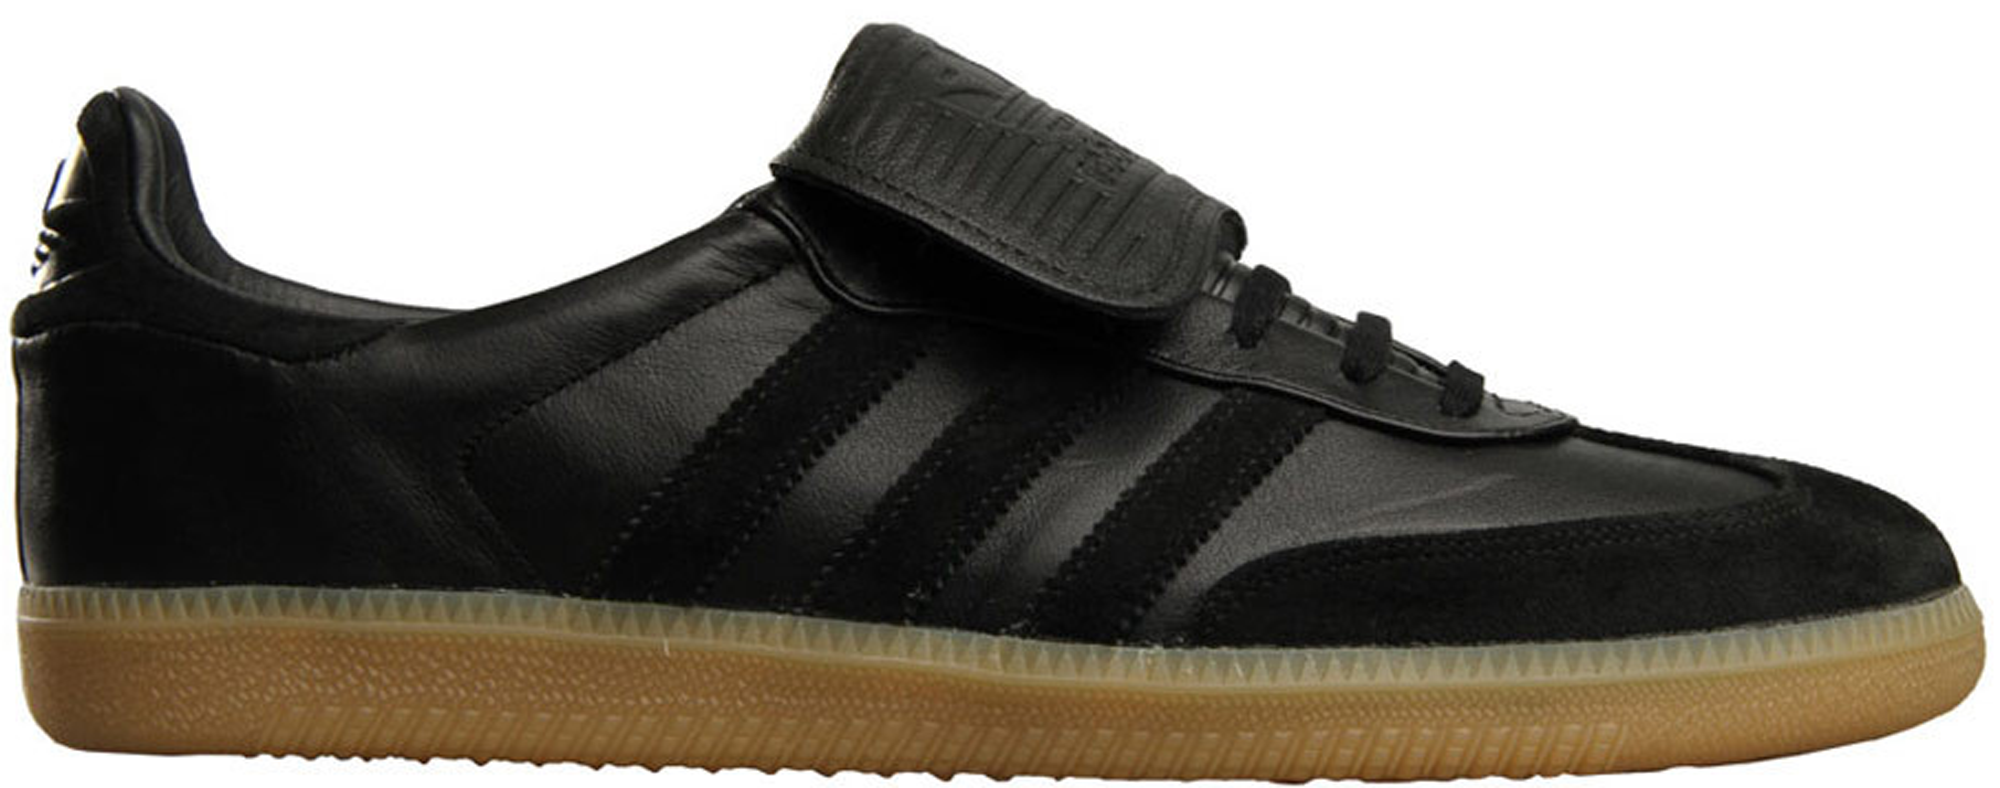 adidas Samba Recon LT Black Gum